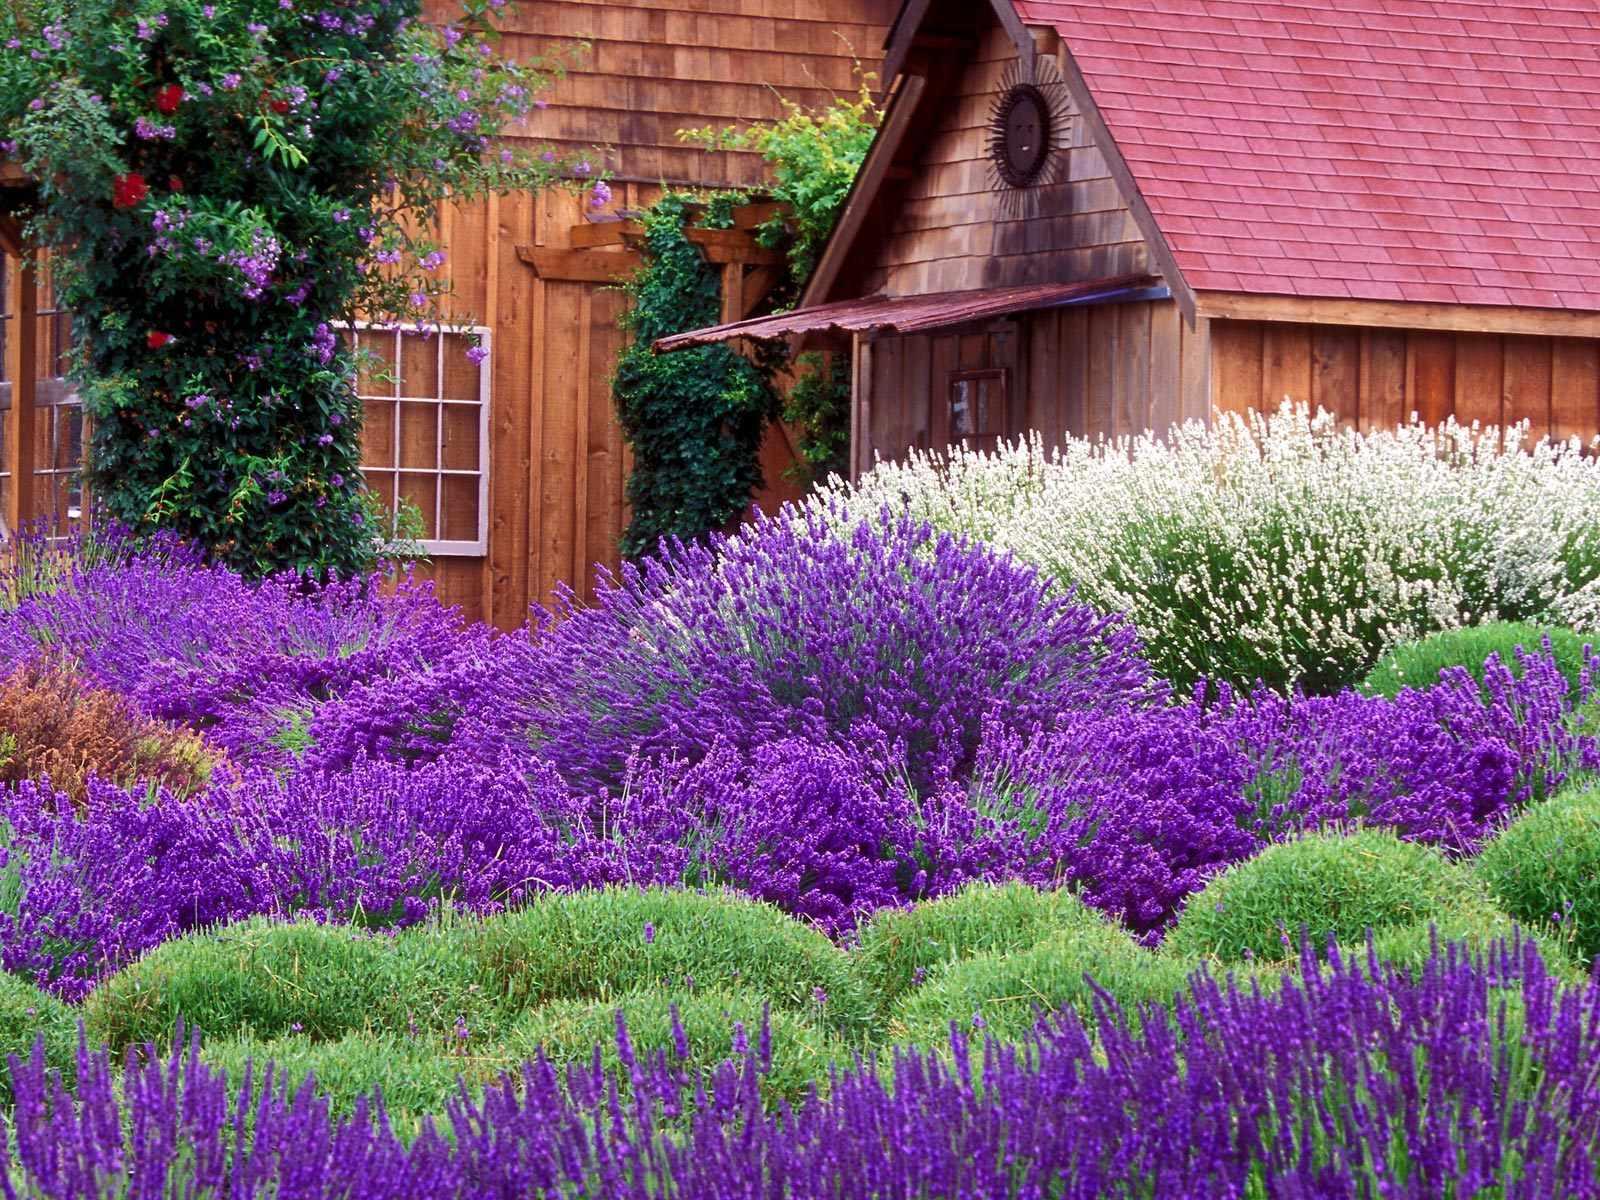 Lavender Cottage Computer Wallpapers Desktop Backgrounds 1600x1200 1600x1200